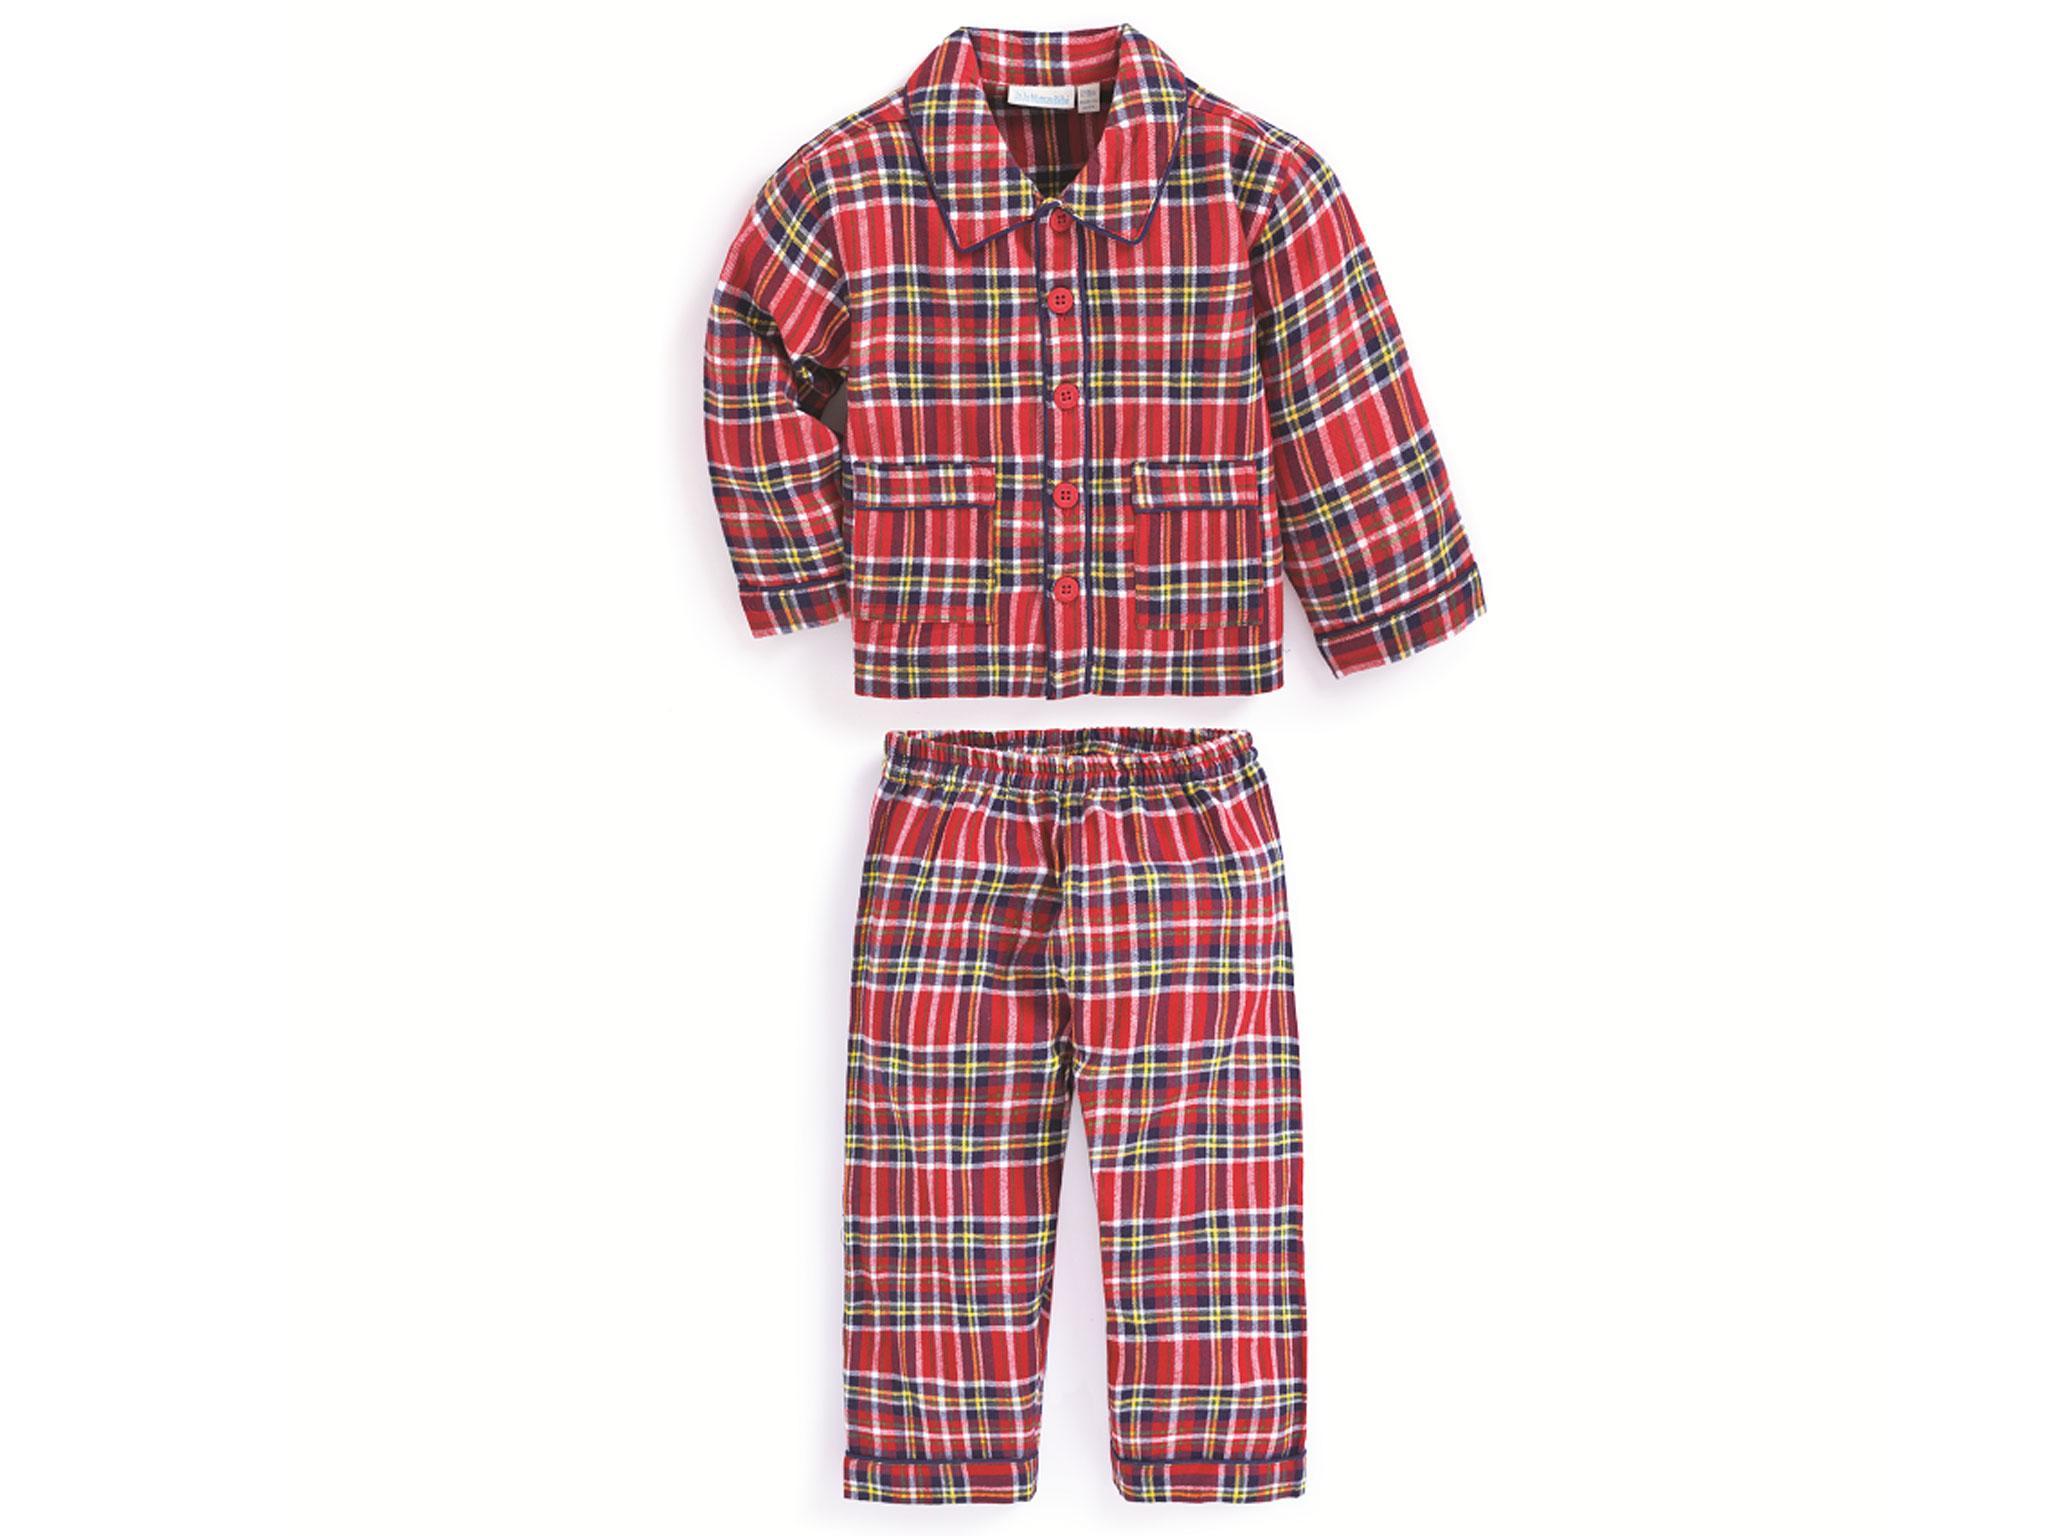 15 best sleepwear brands for kids | The Independent